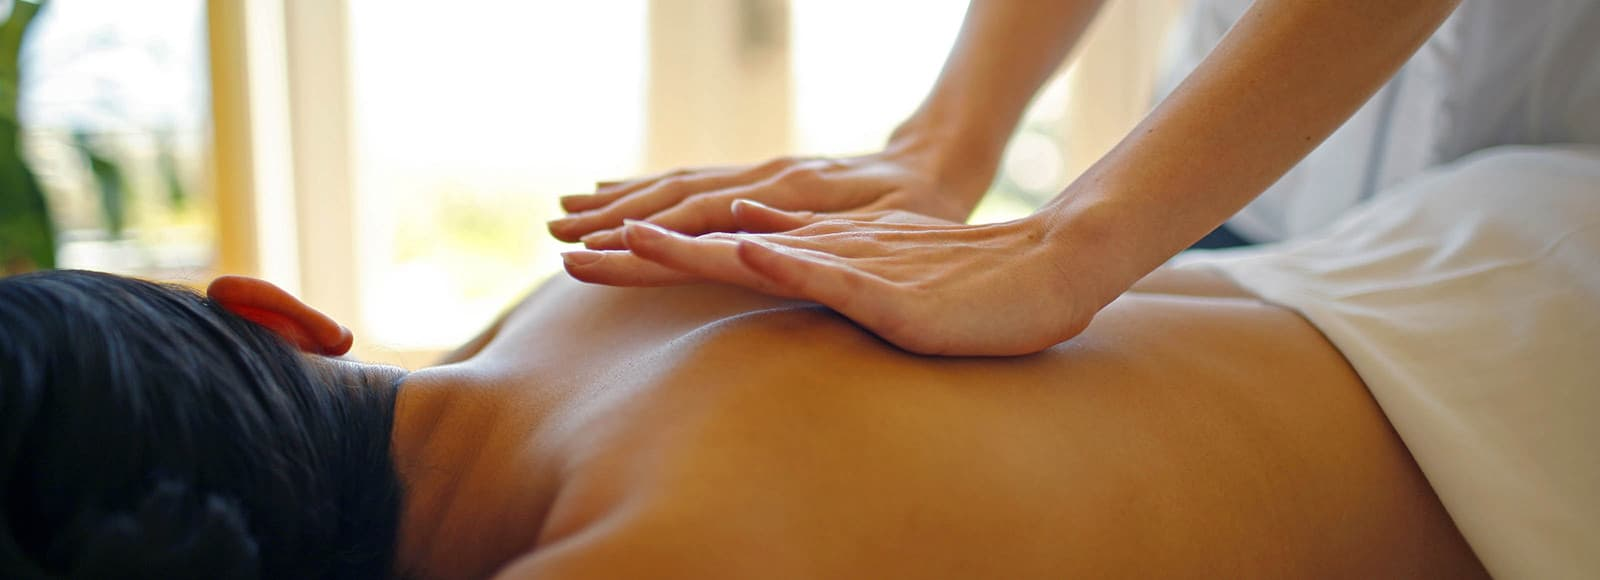 Acupressure and Massage Treatment